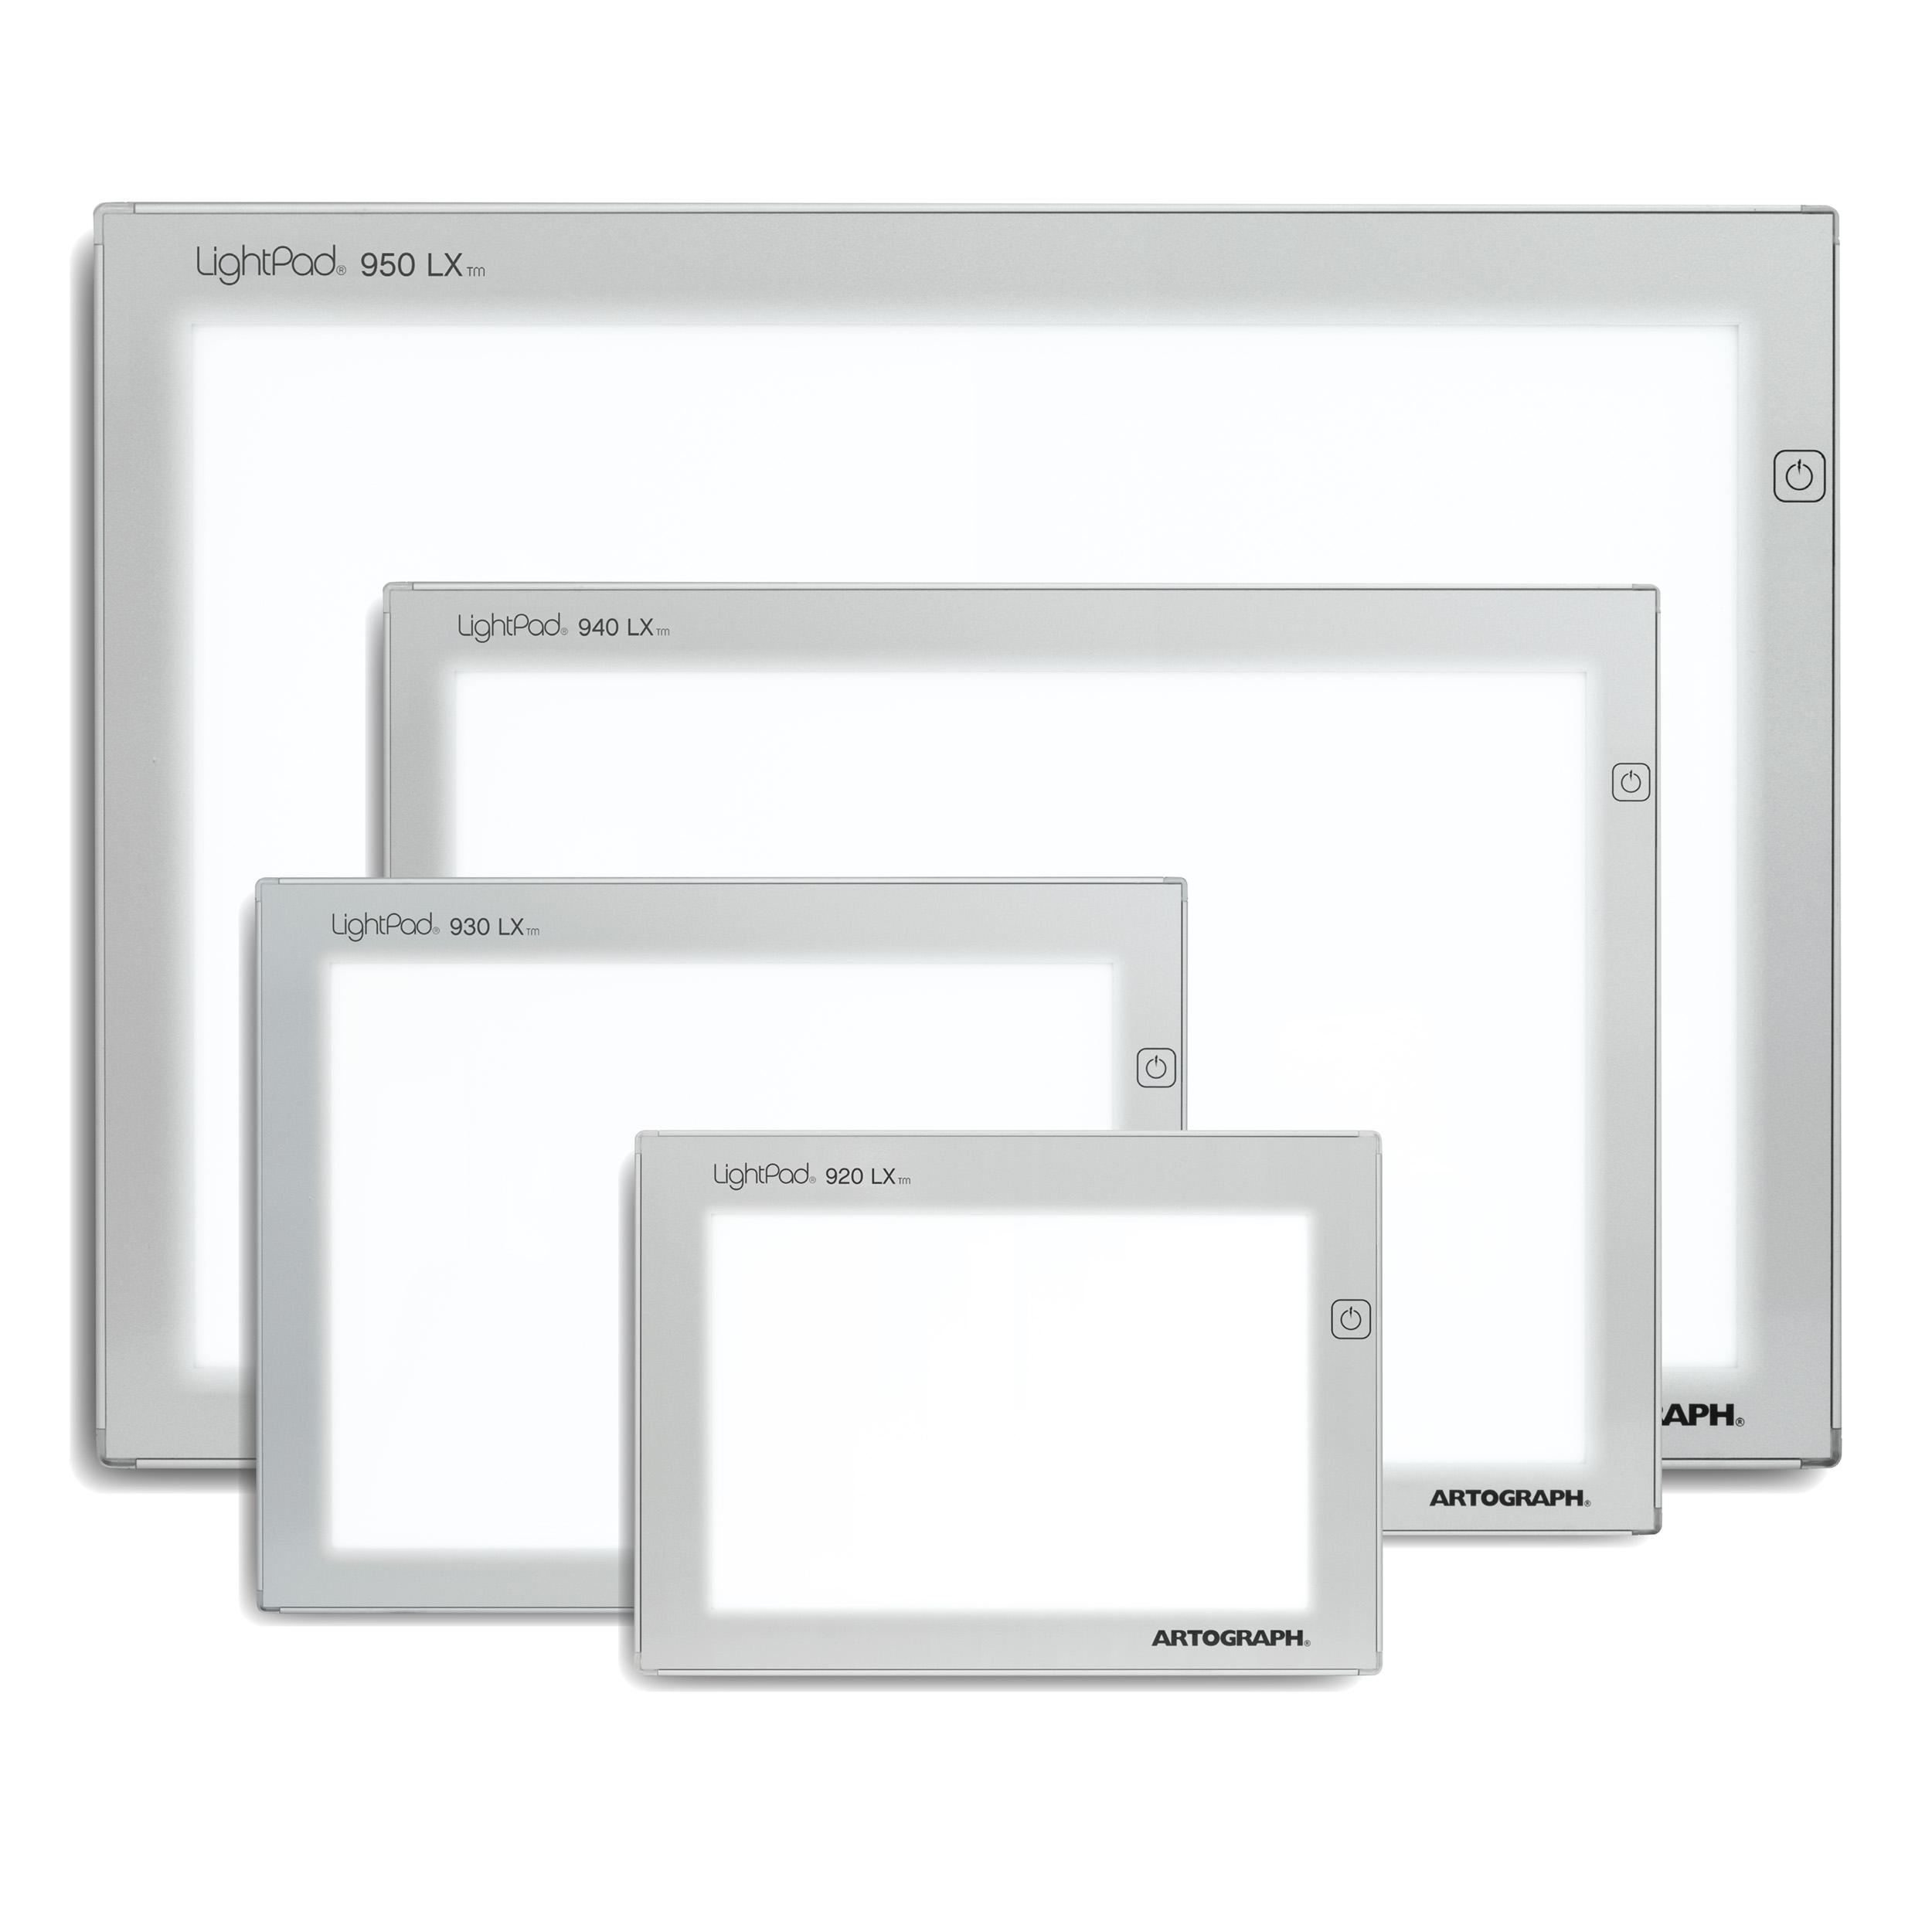 25920-25950-LightPad-group